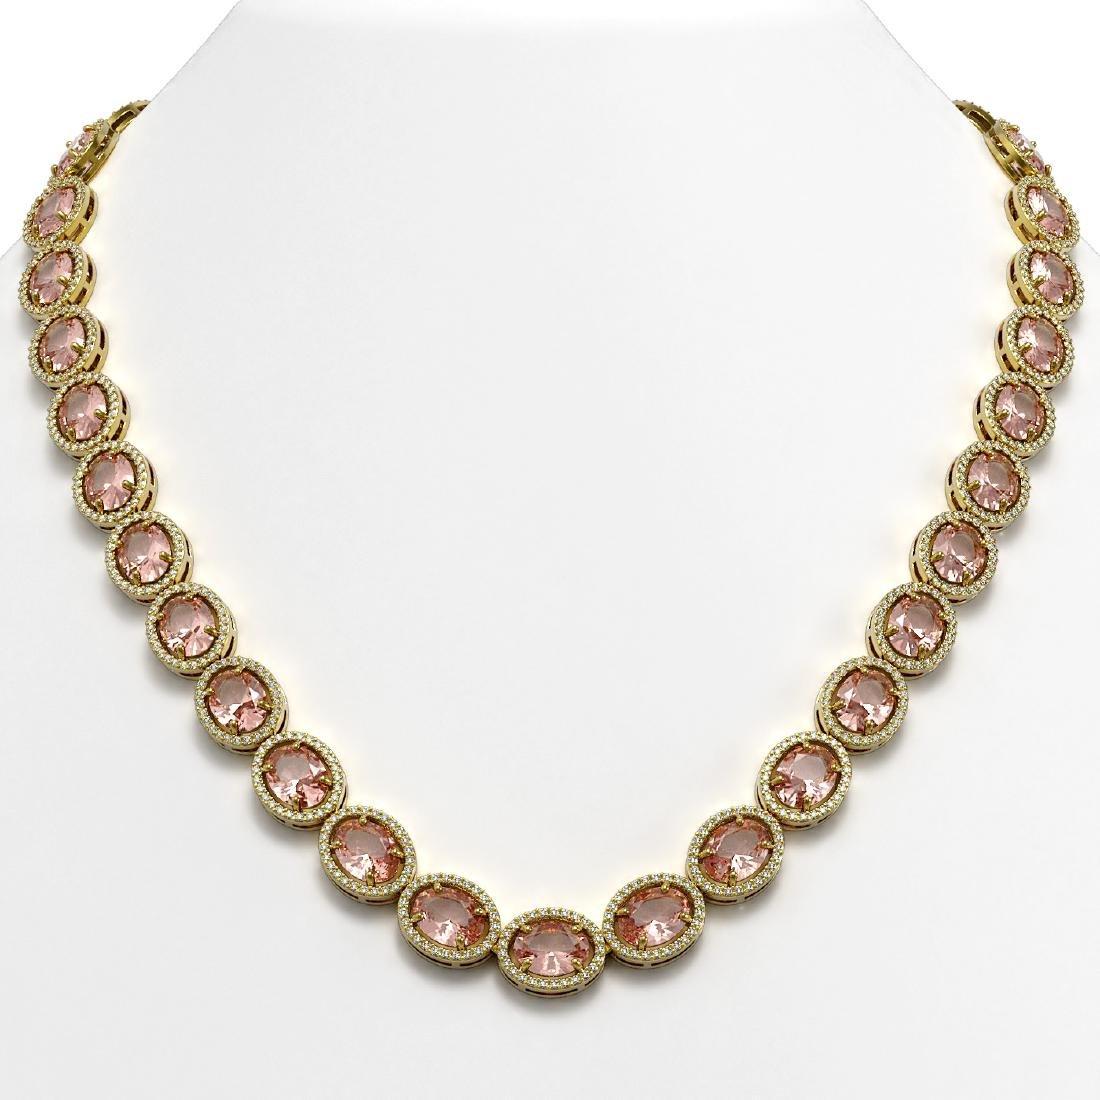 52.63 CTW Morganite & Diamond Halo Necklace 10K Yellow